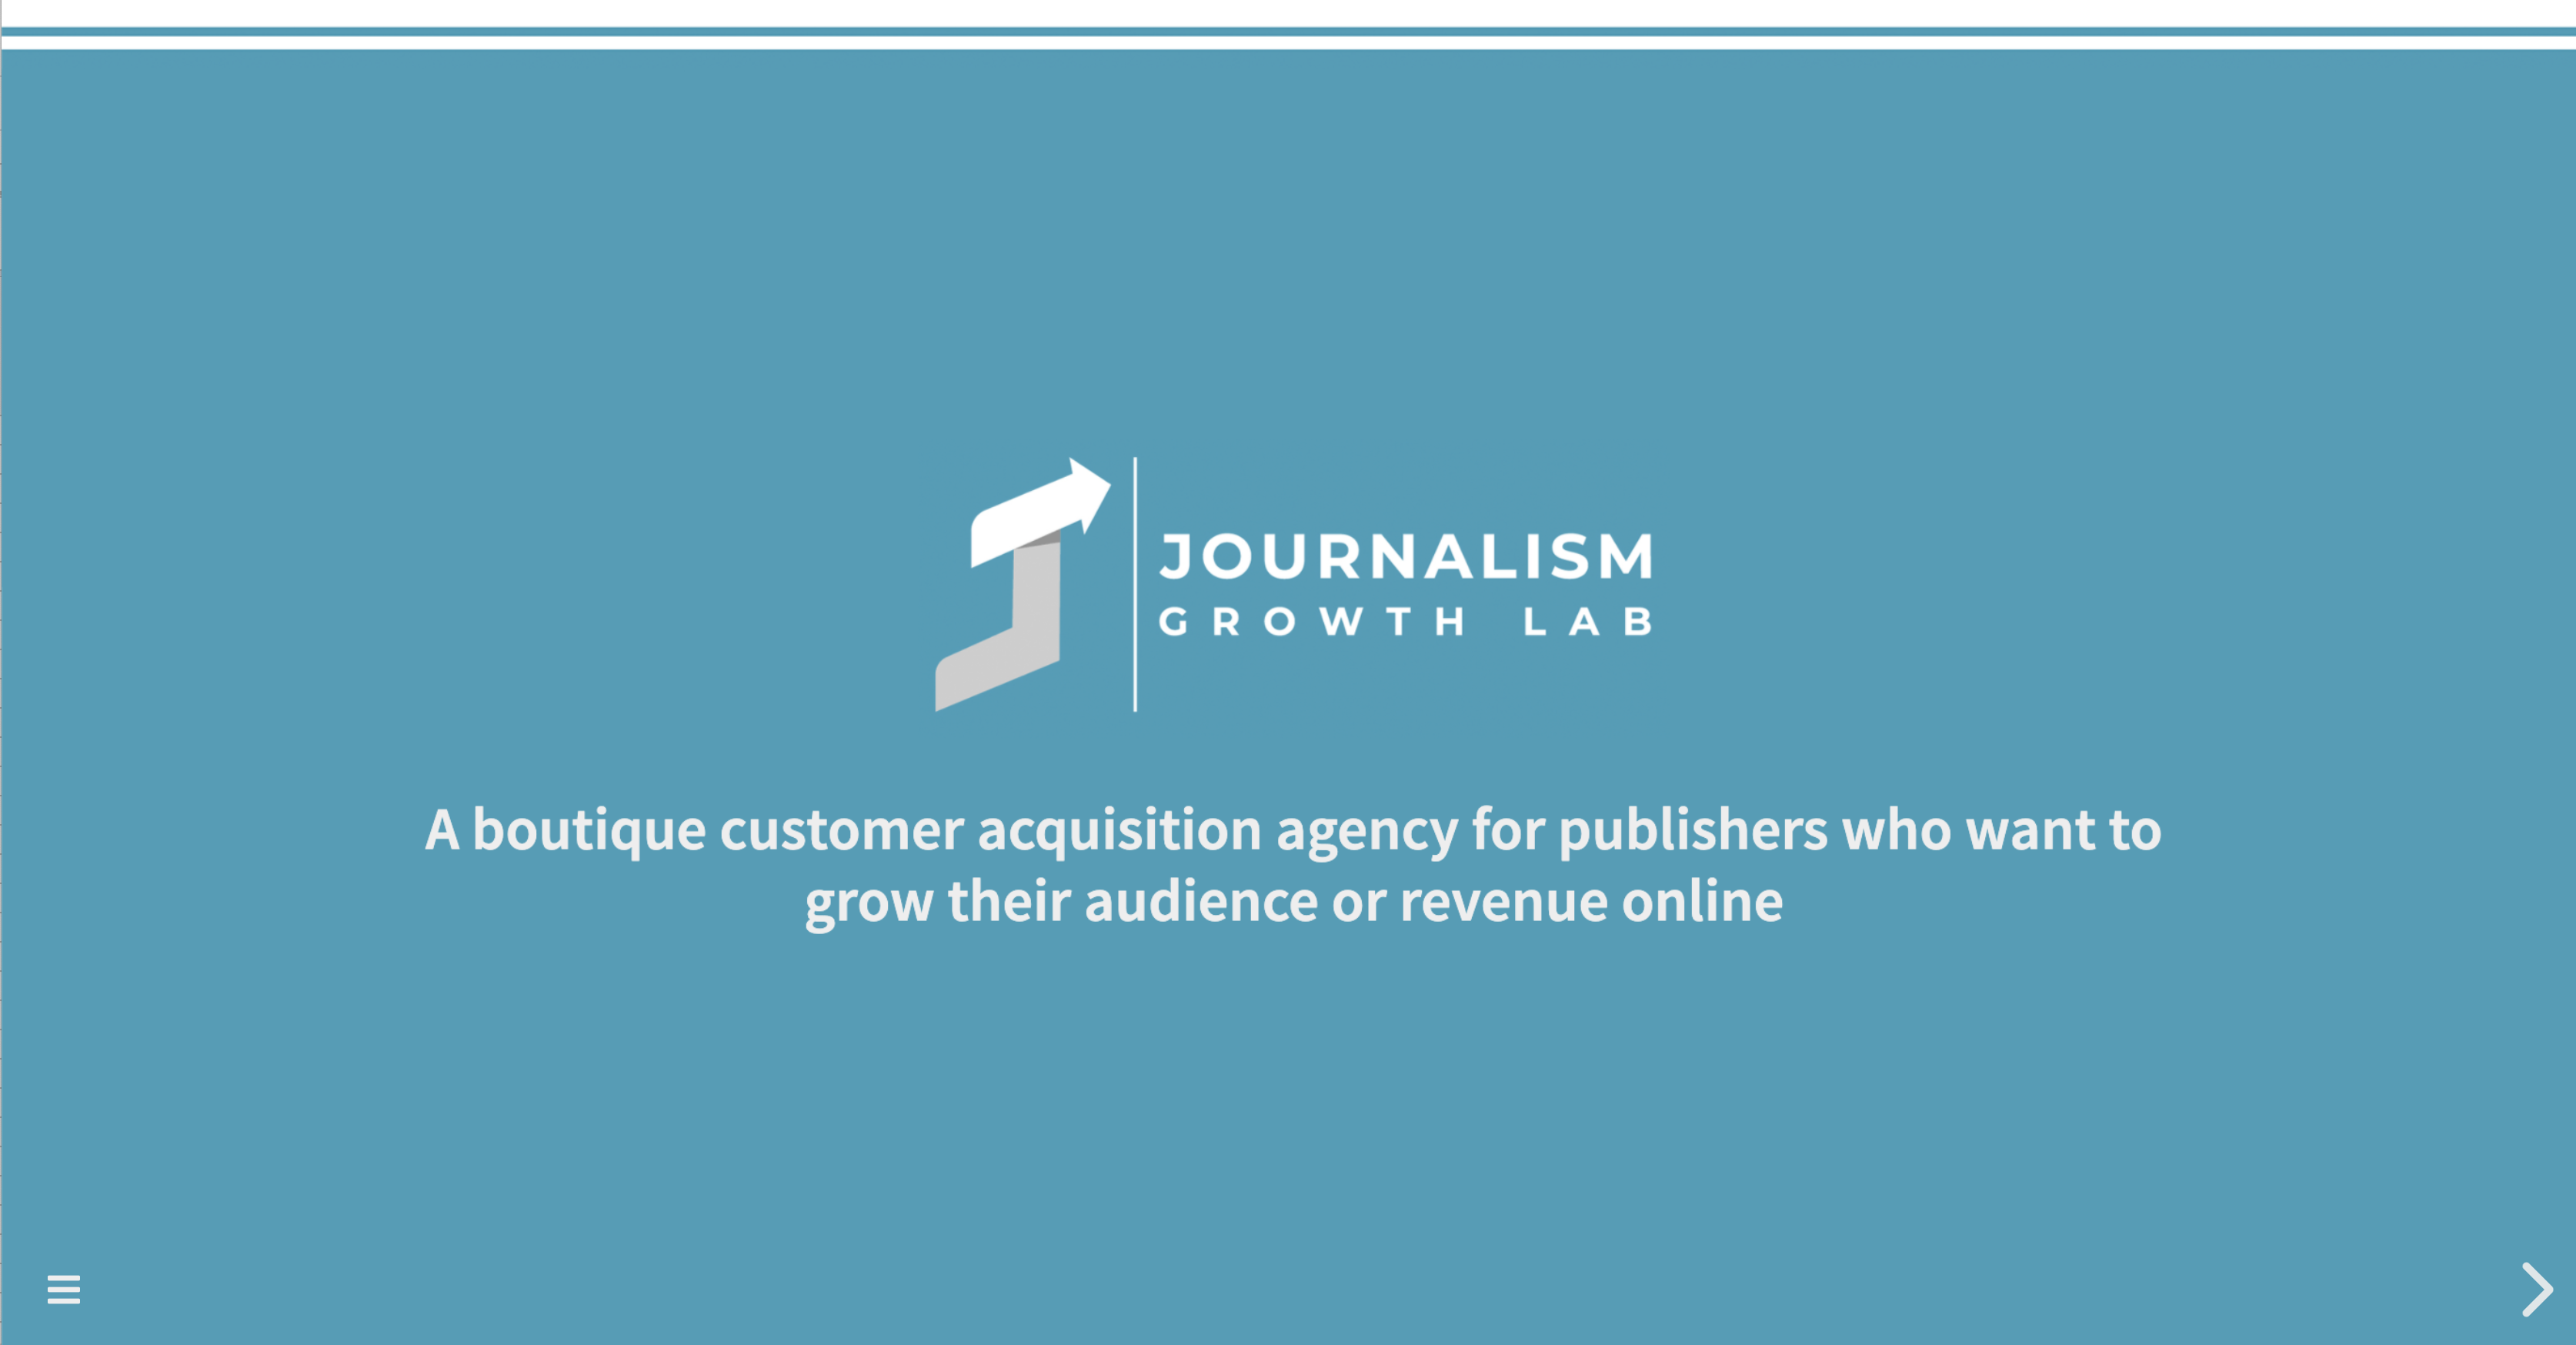 Journalism Growth Lab